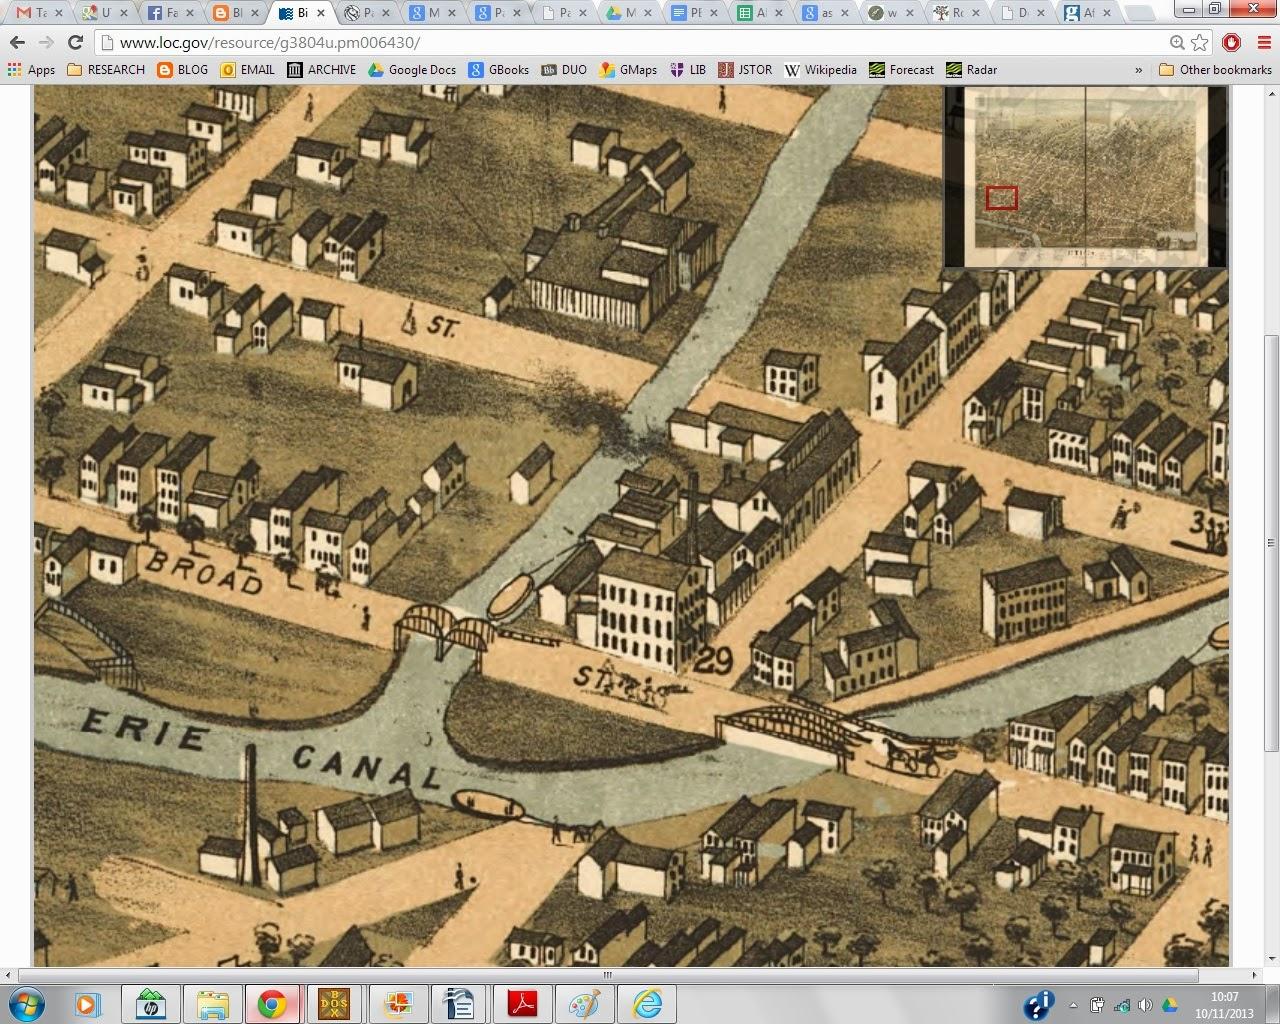 Peckhamu0027s Foundry No 2 1873 evidently